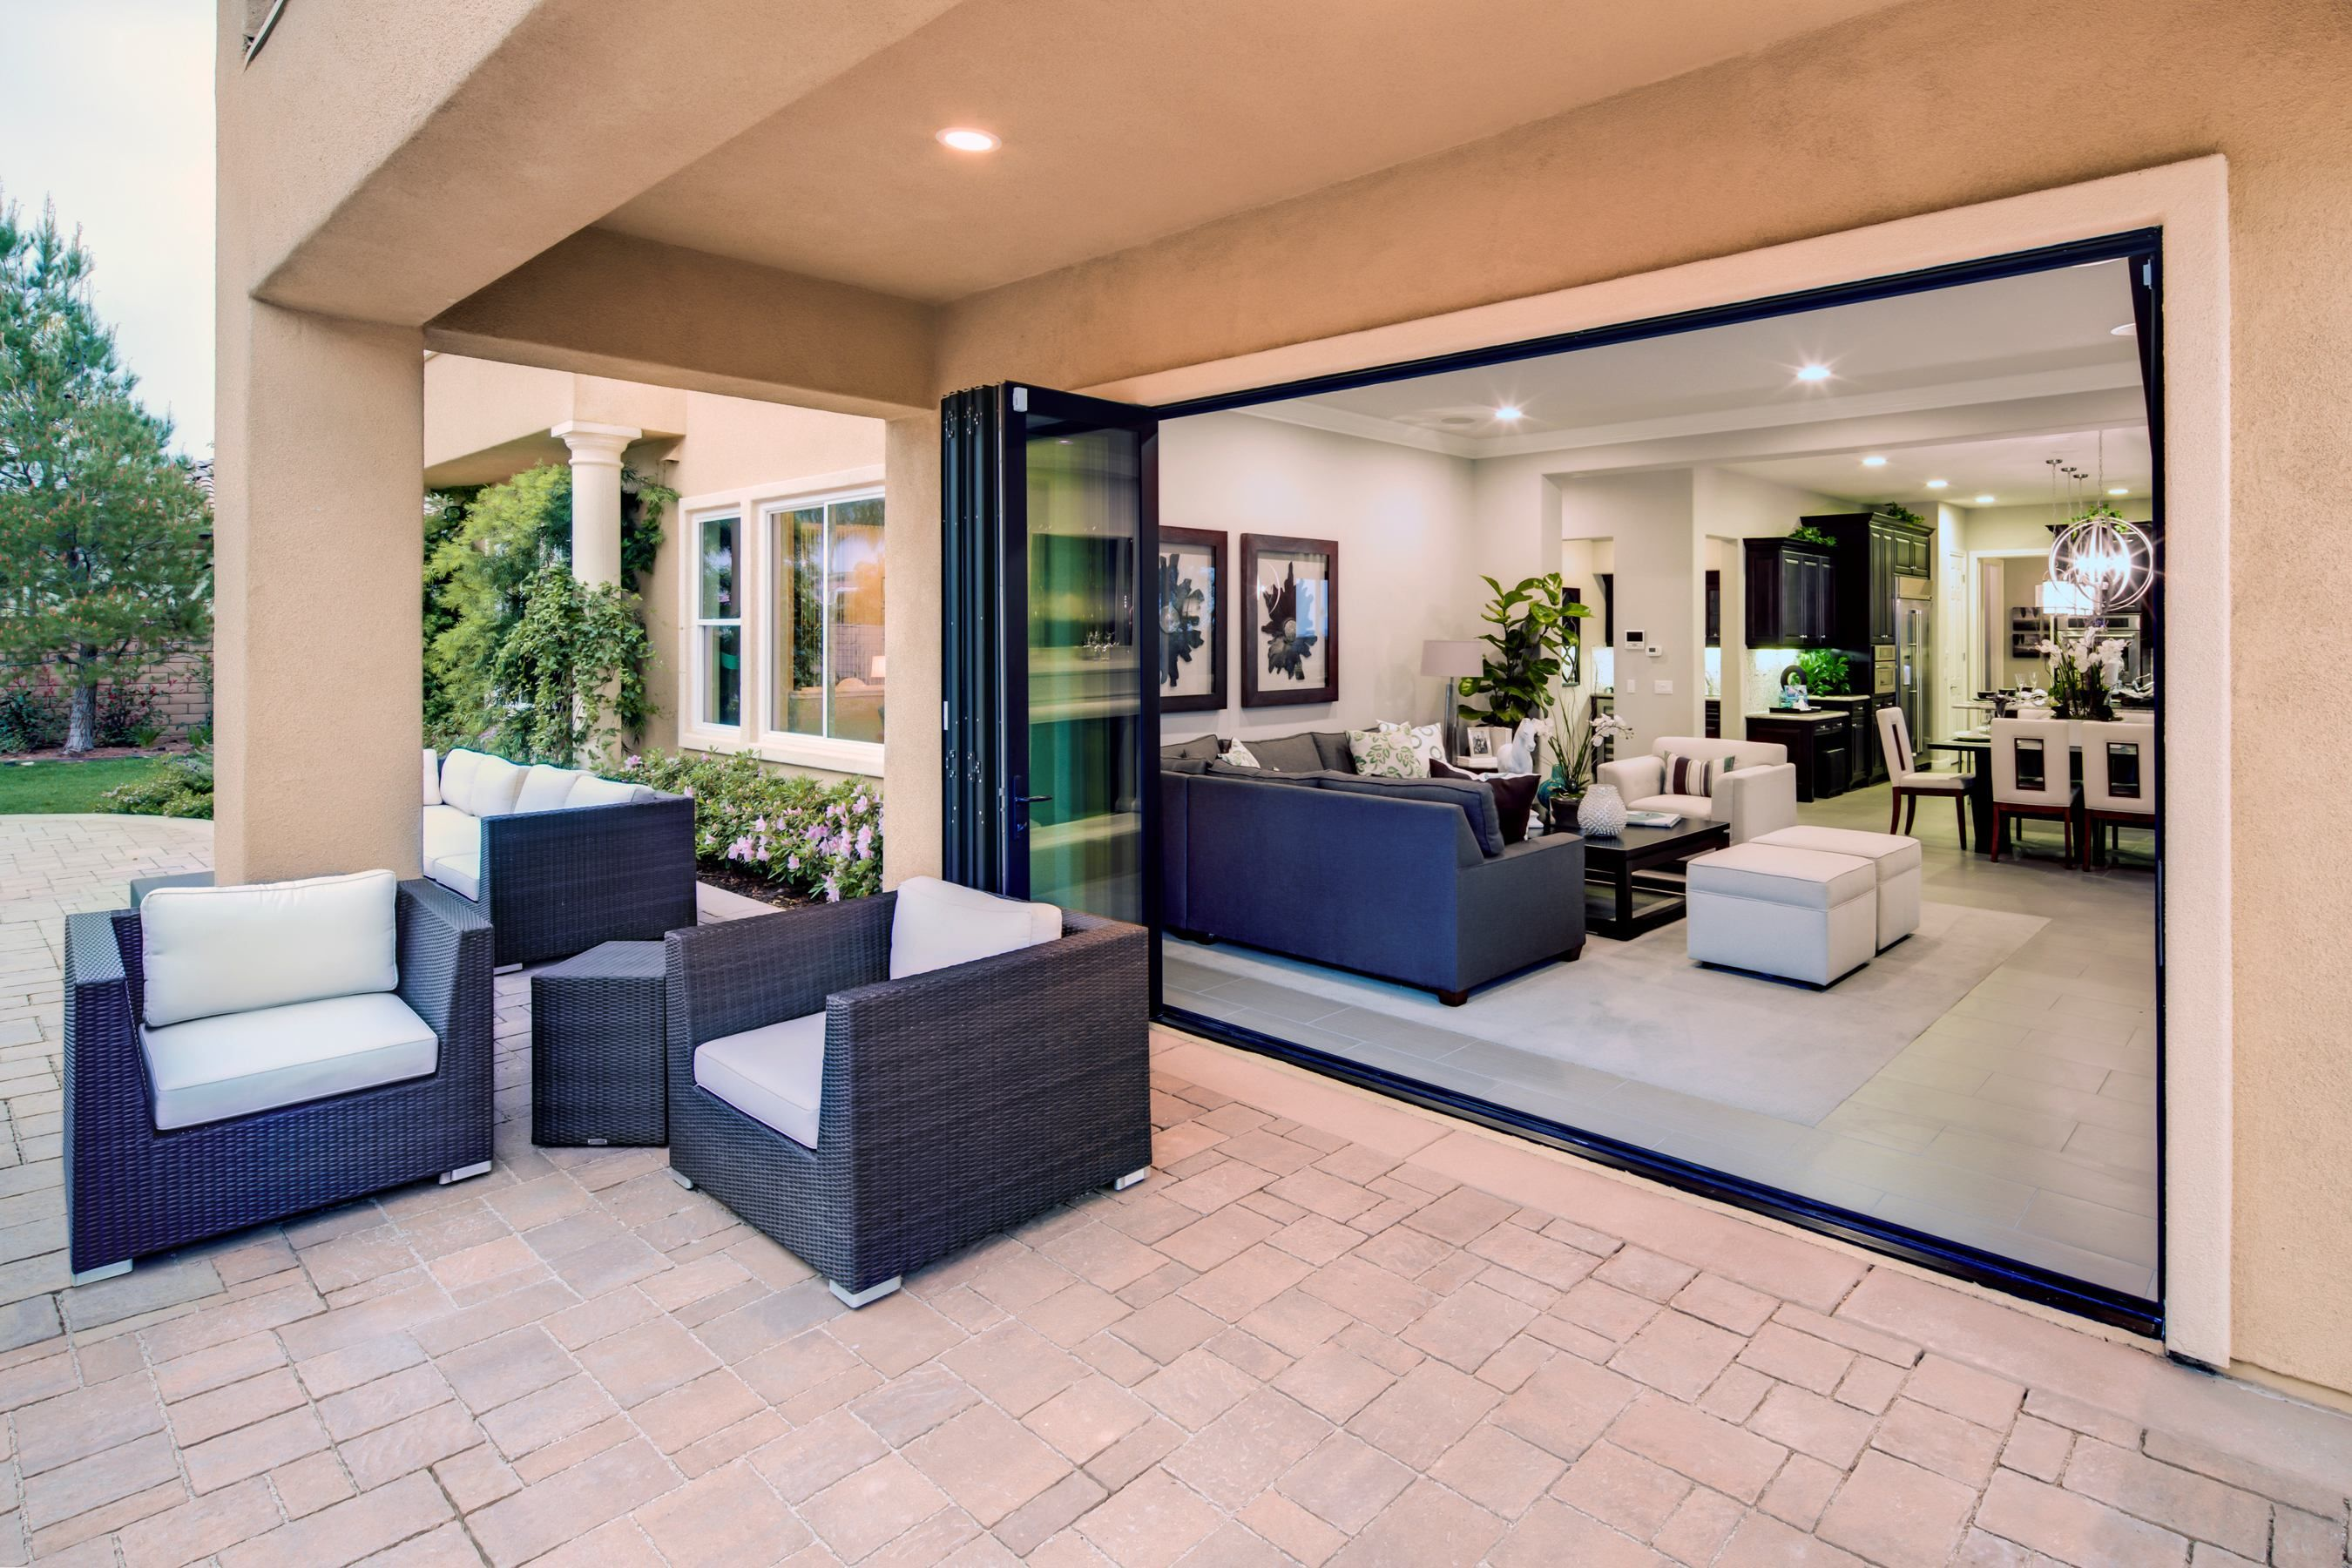 Glass Door Designs For Living Room Pleasing ❤Outdoor Living Design ❤I'am A Summer Woman  Out Door Living Design Decoration